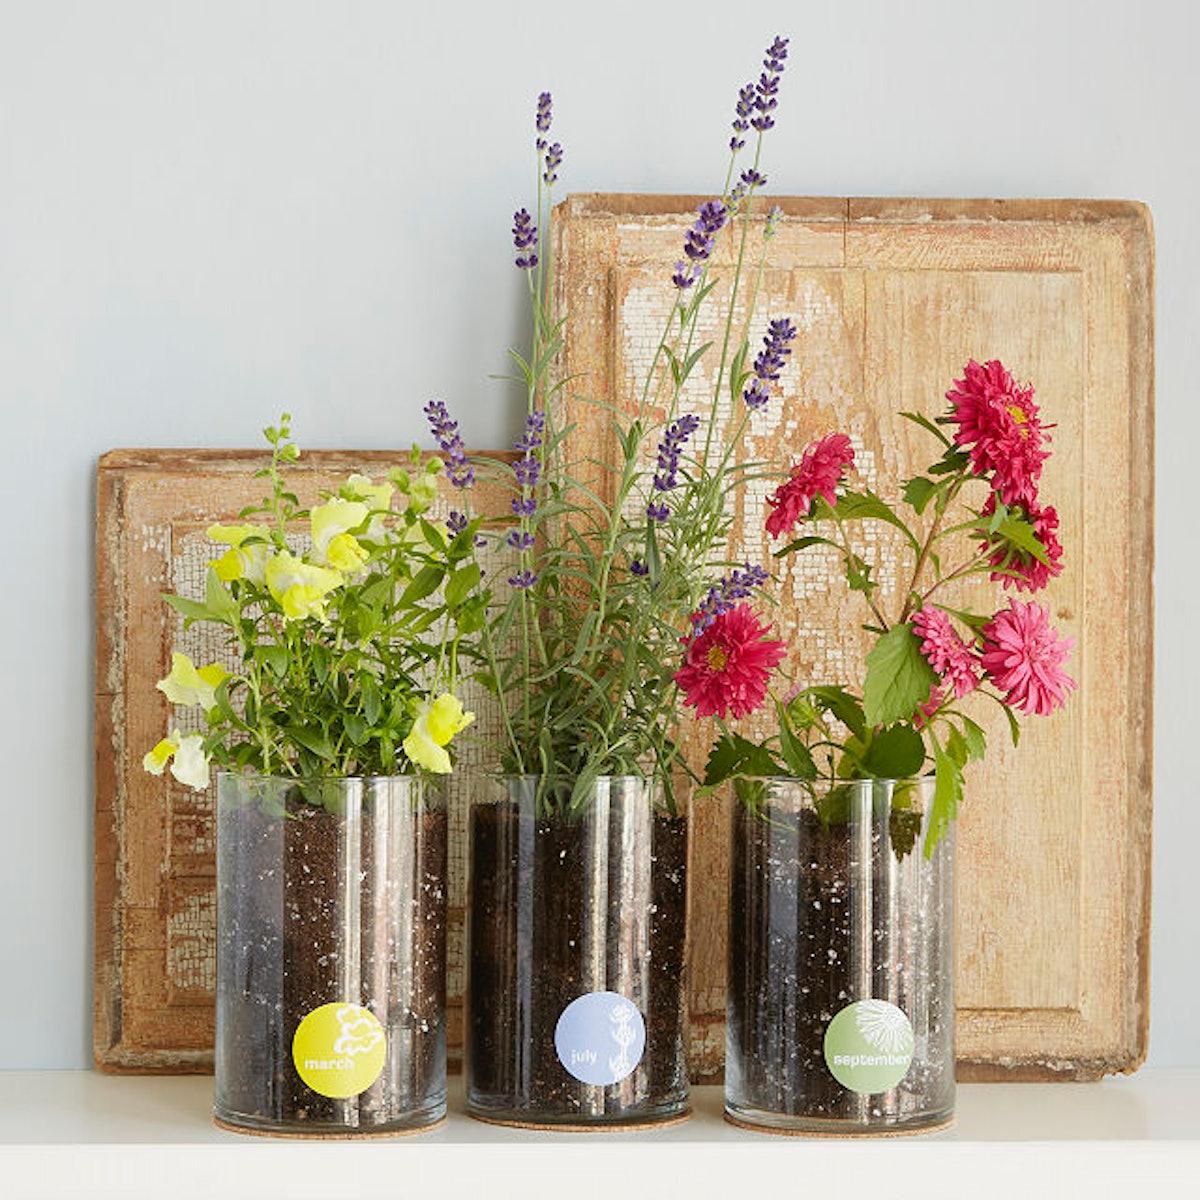 Uncommon Goods Birth Month Flower Grow Kit